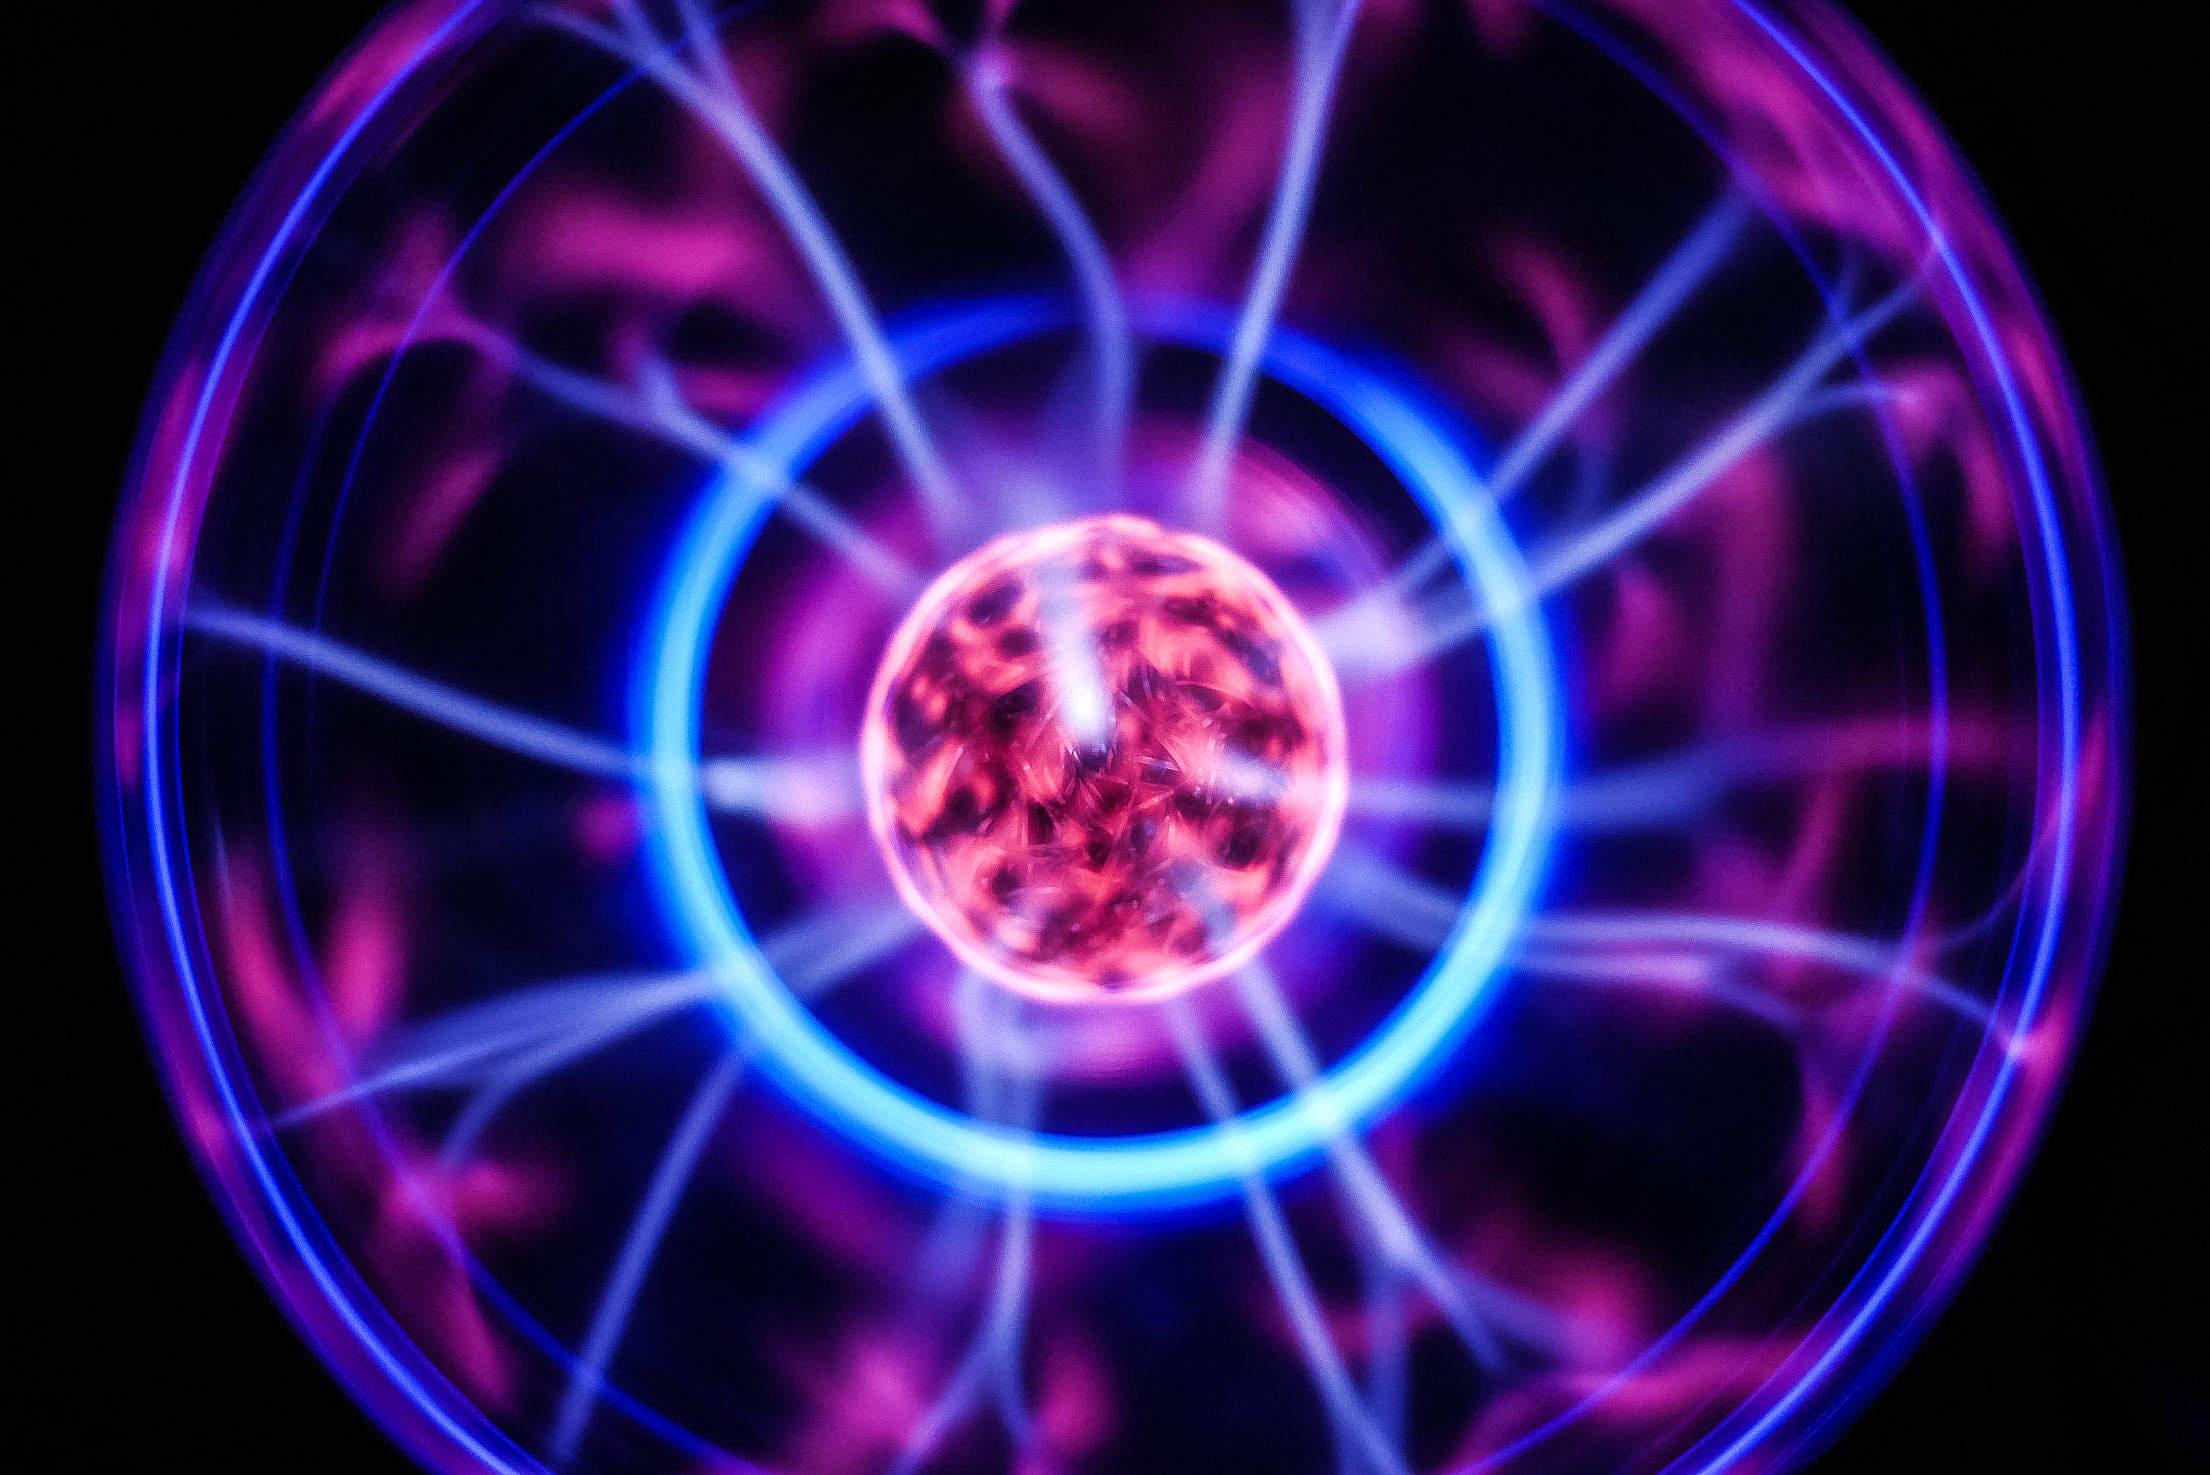 Plasma Ball Lamp Free Stock Photo